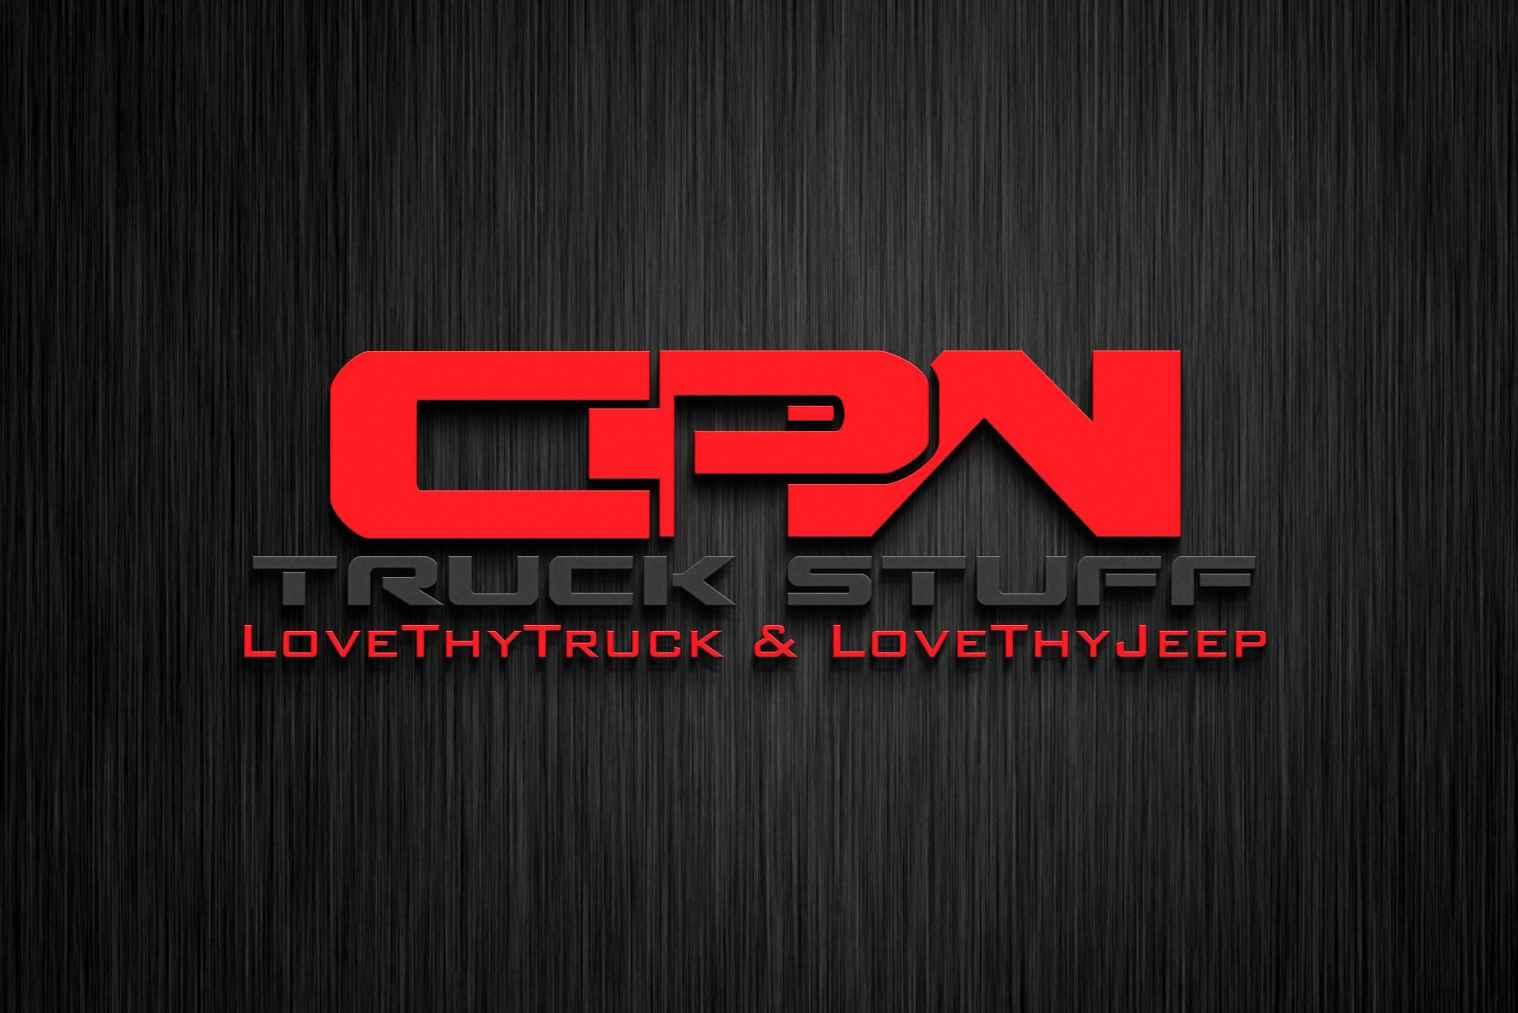 CPW Truck Stuff Logo